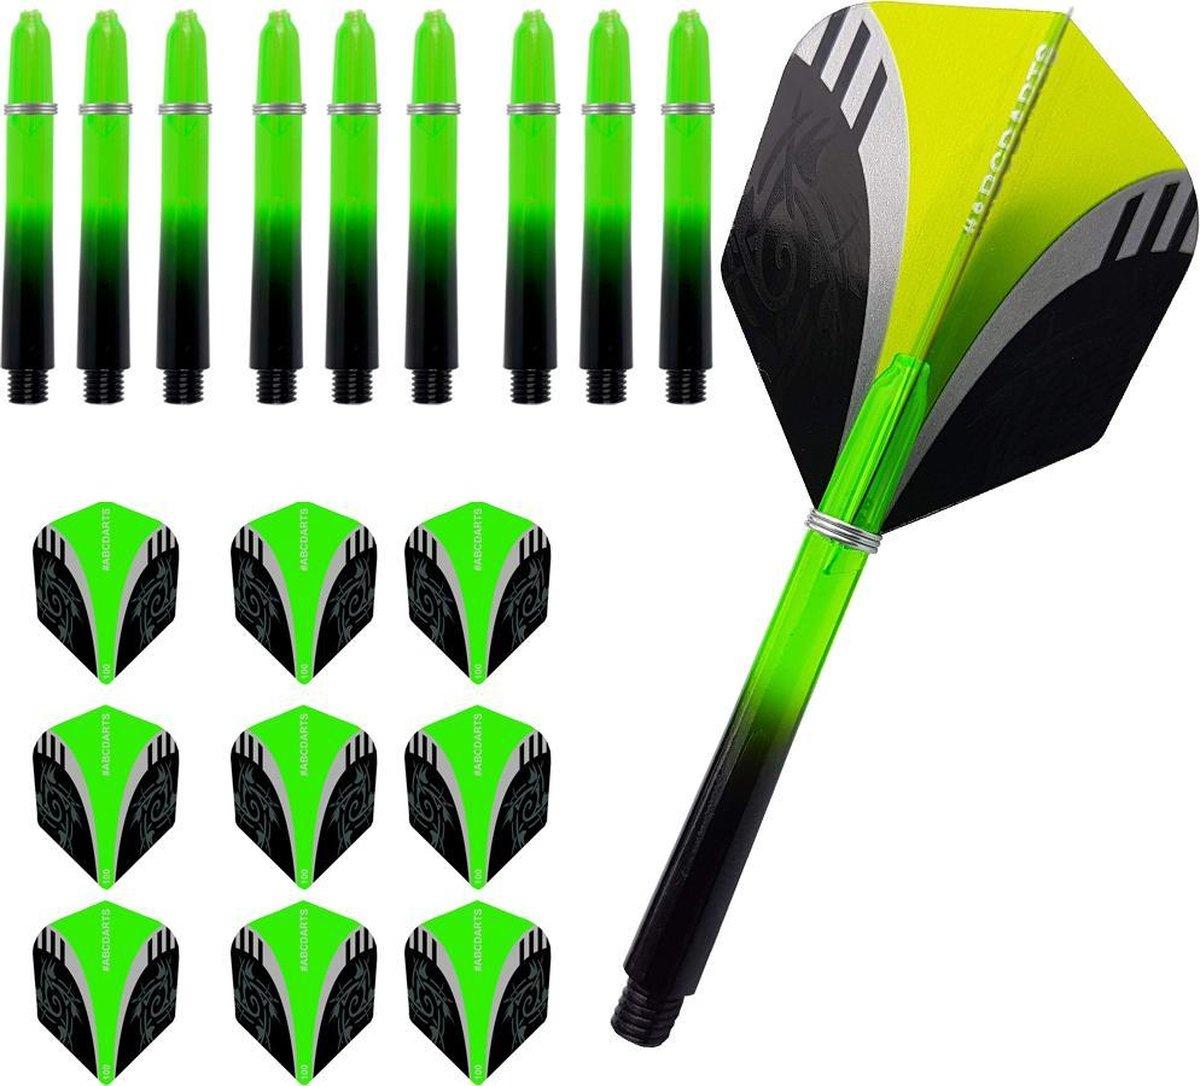 ABC Dart Flights en Darts Shafts Short - Tribal groen - 3 sets